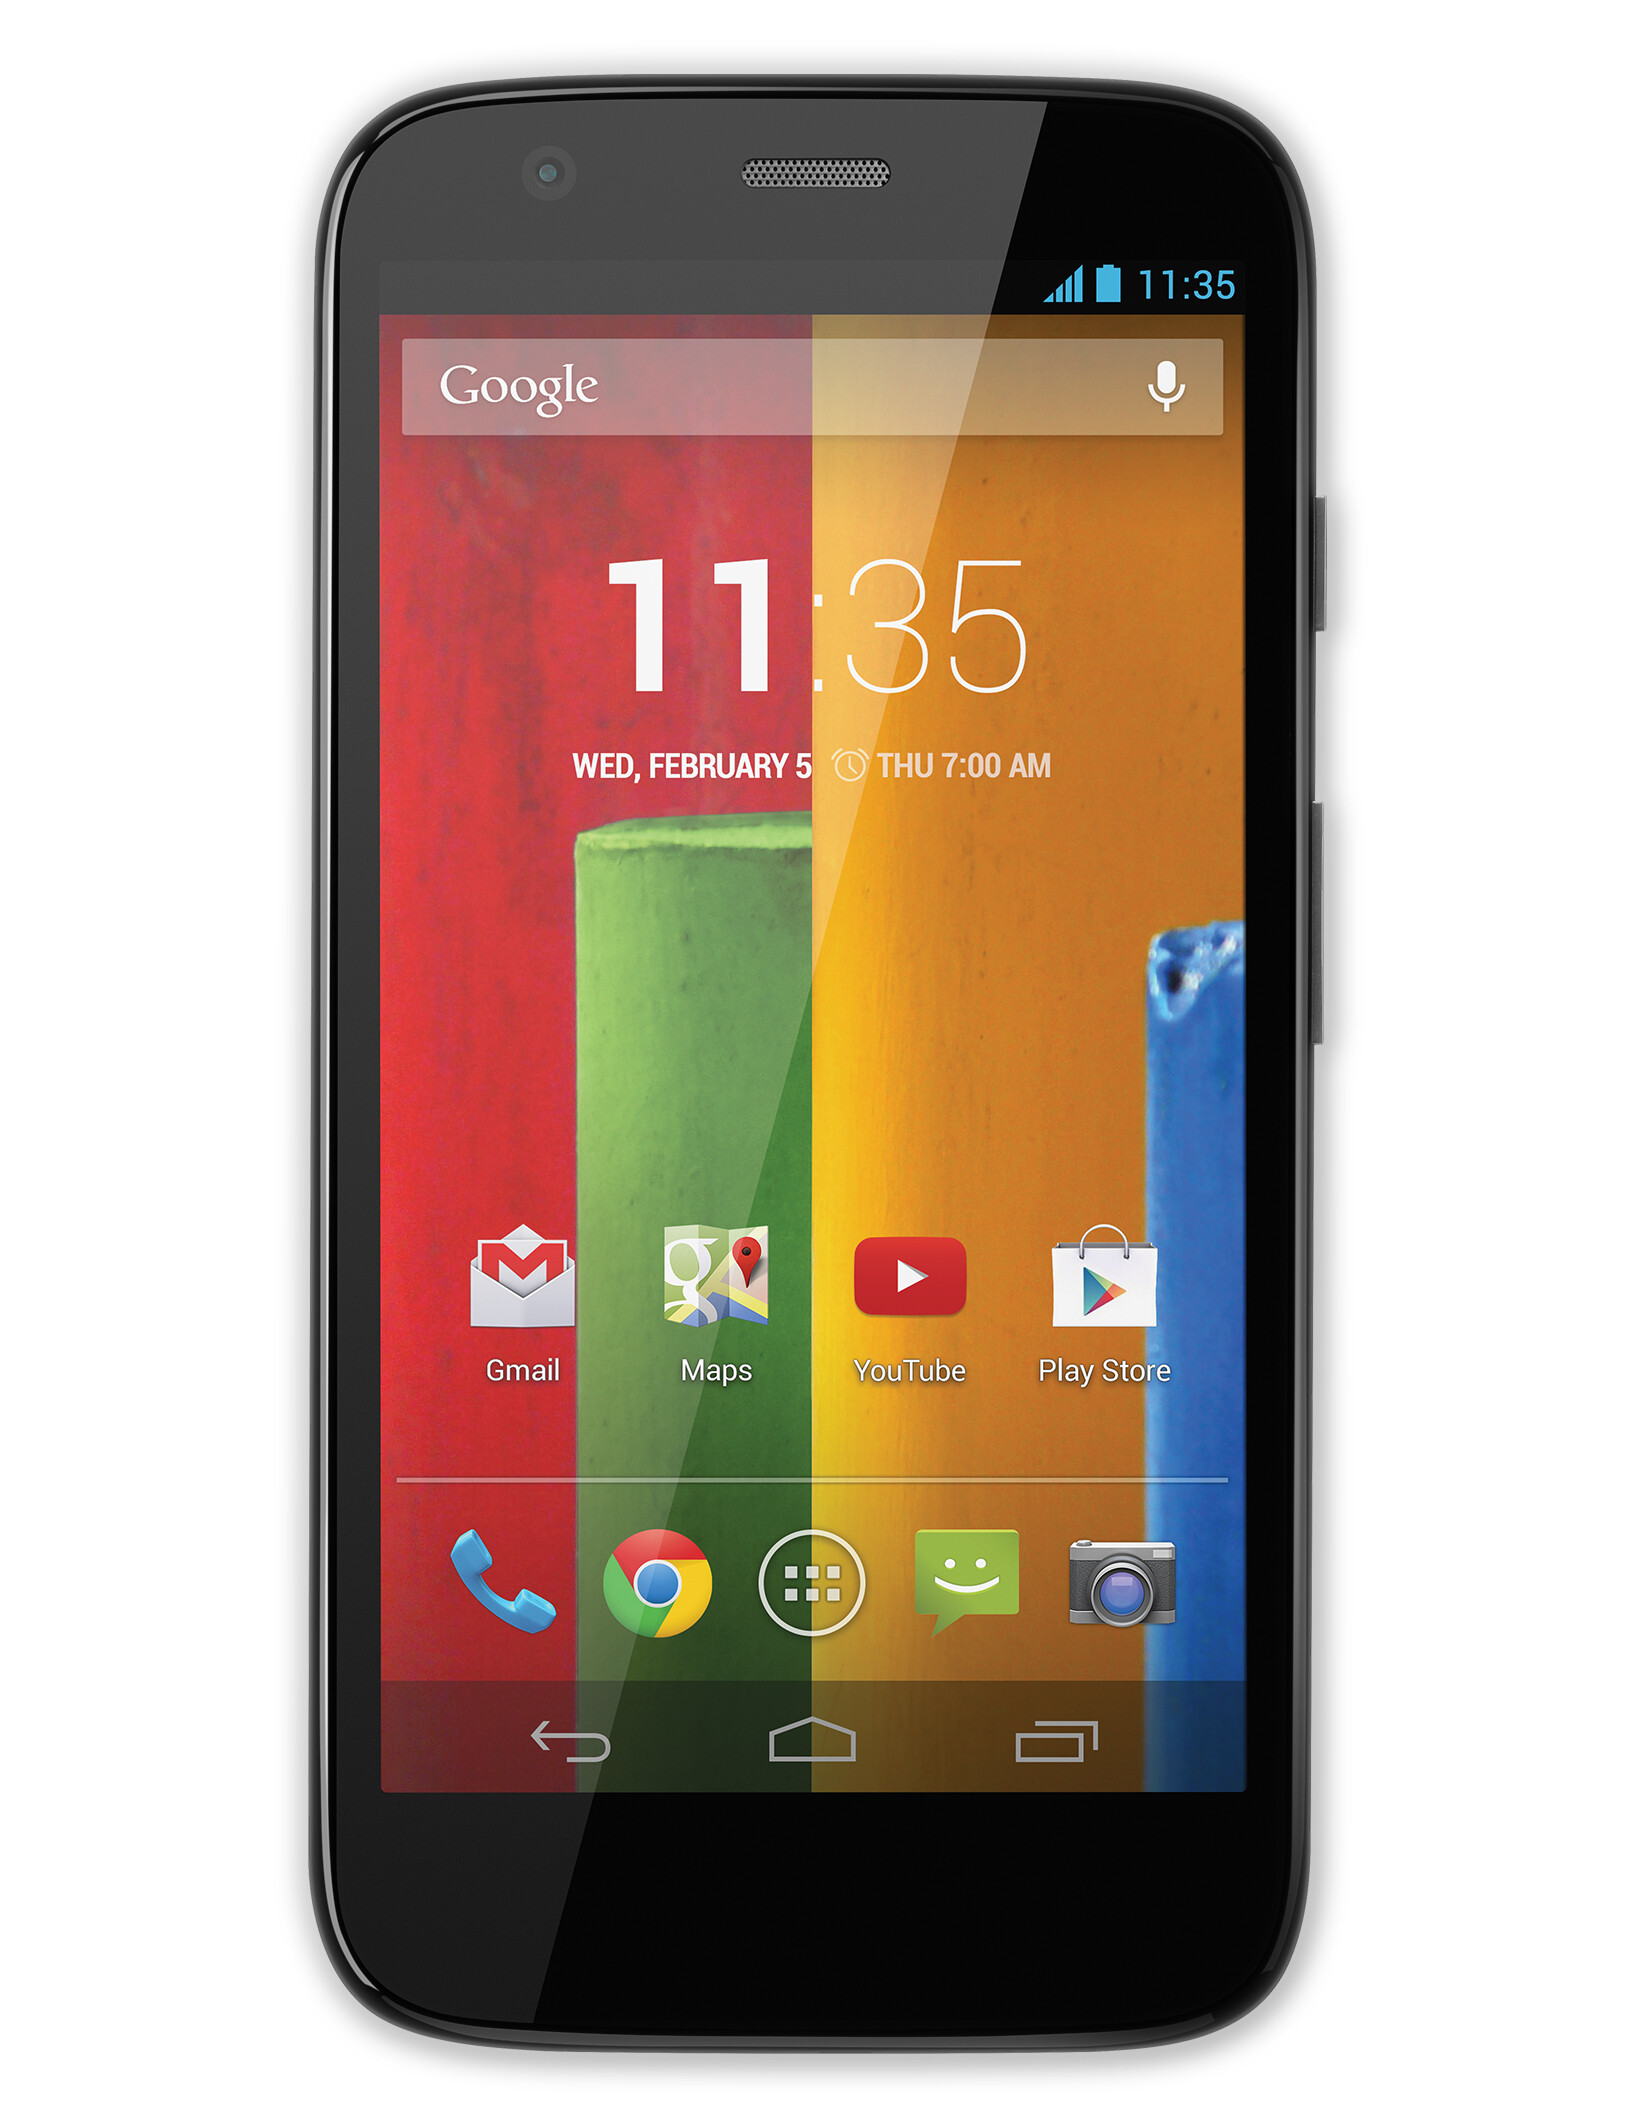 Phone Motorola All Android Phones motorola moto g specs g